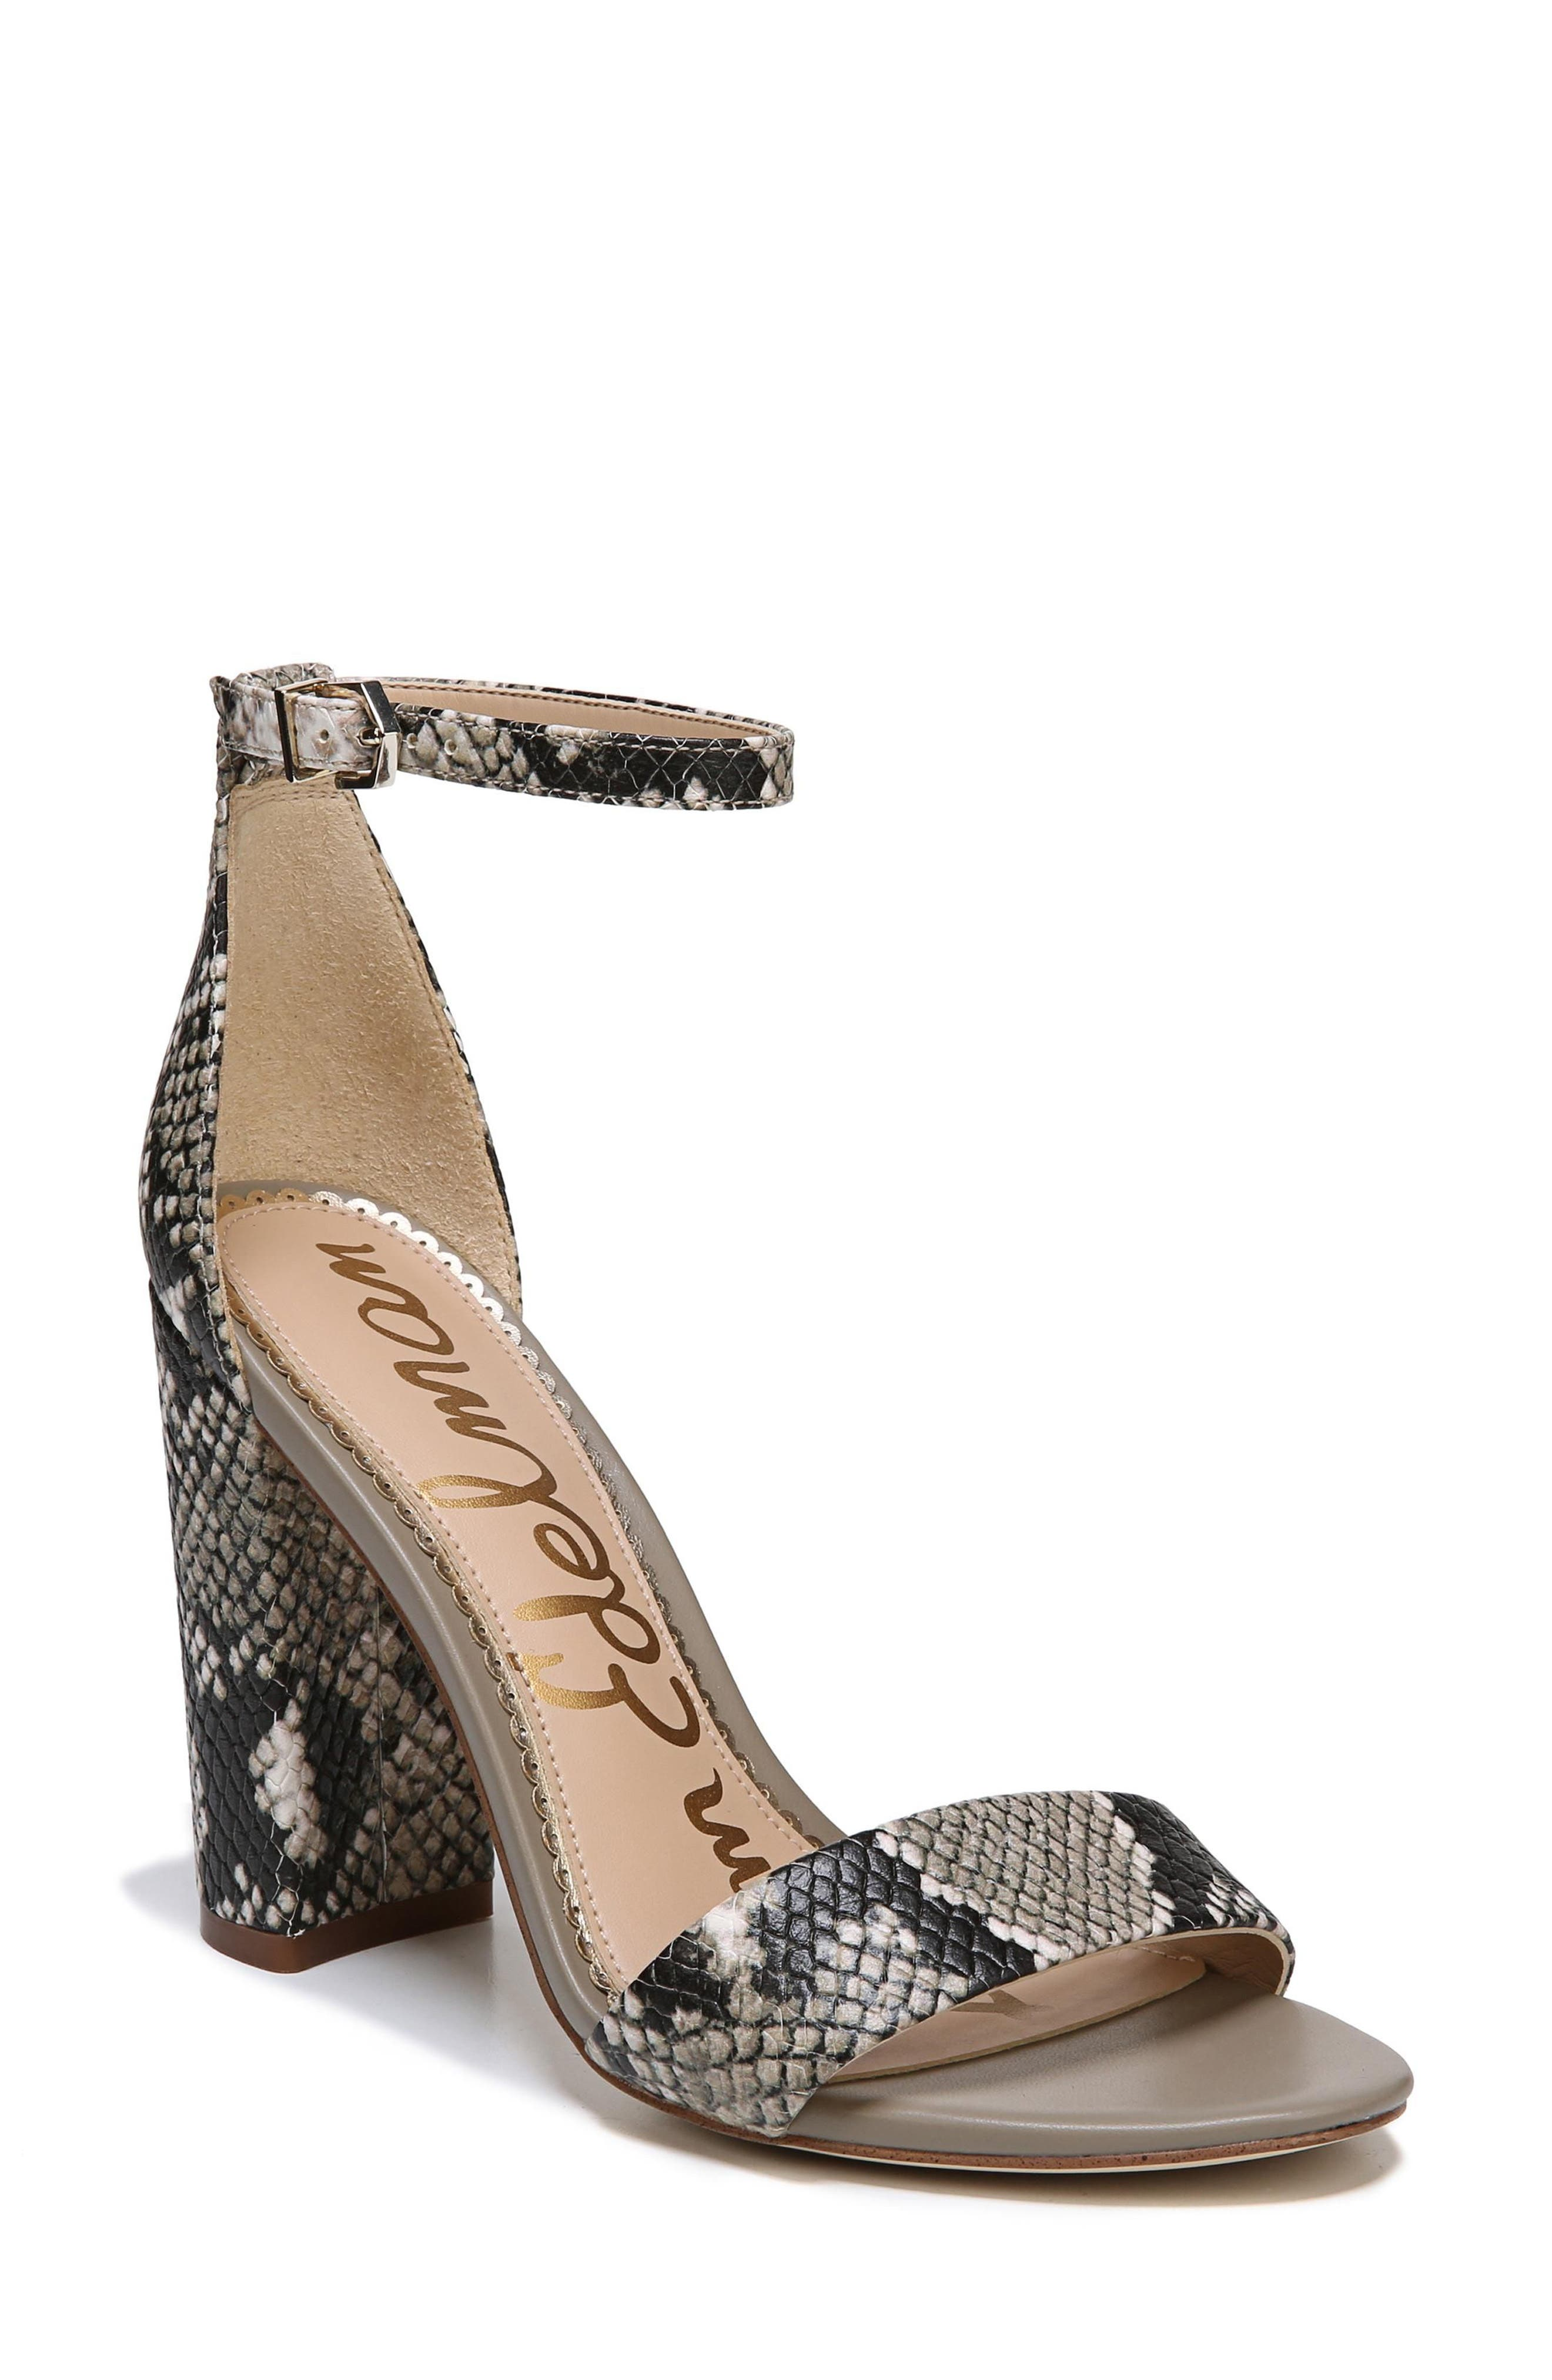 Yaro Ankle Strap Sandal,                         Main,                         color, Natural Snake Print Leather